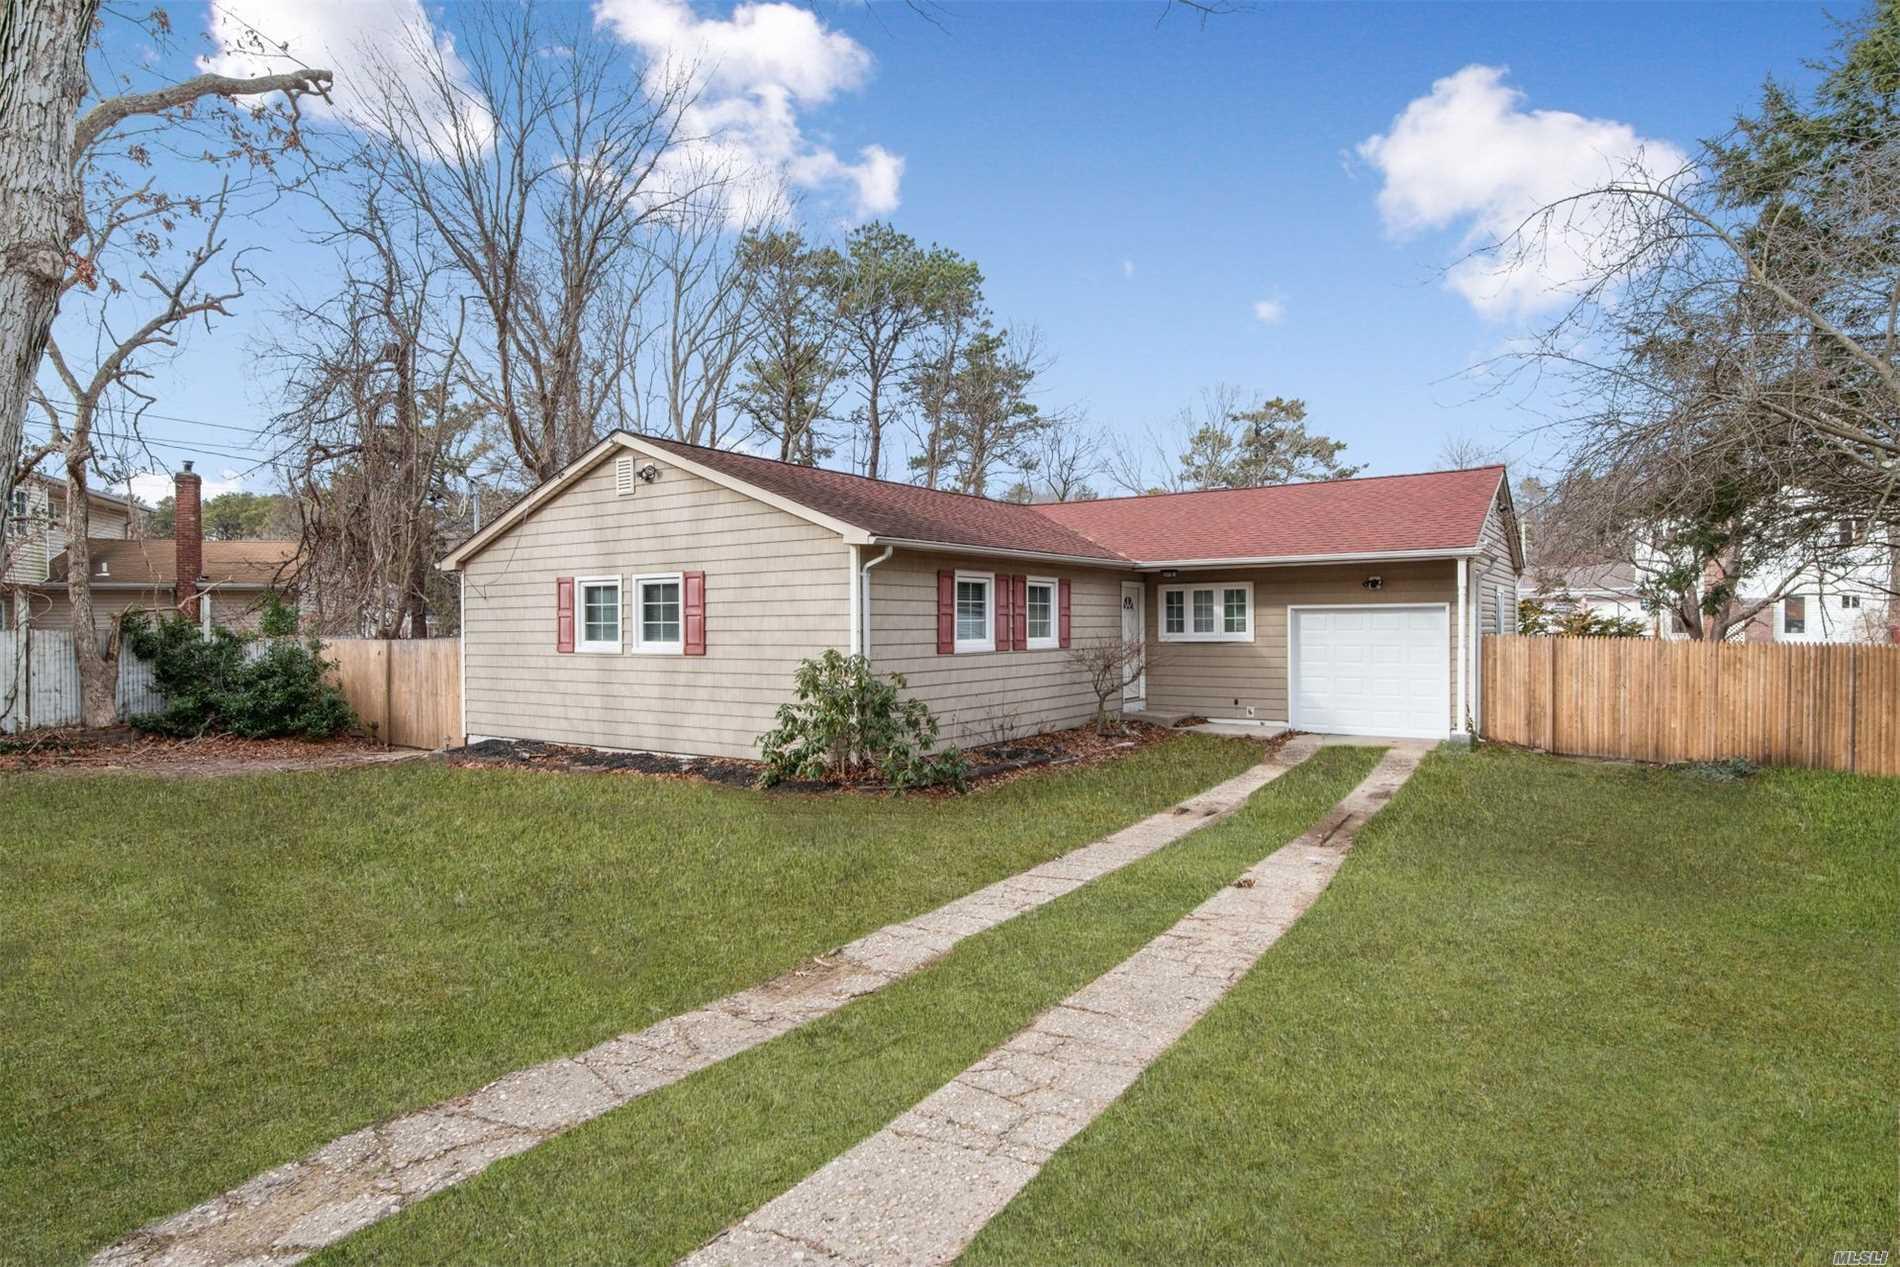 Photo of home for sale at 19 Richmond Blvd, Ronkonkoma NY